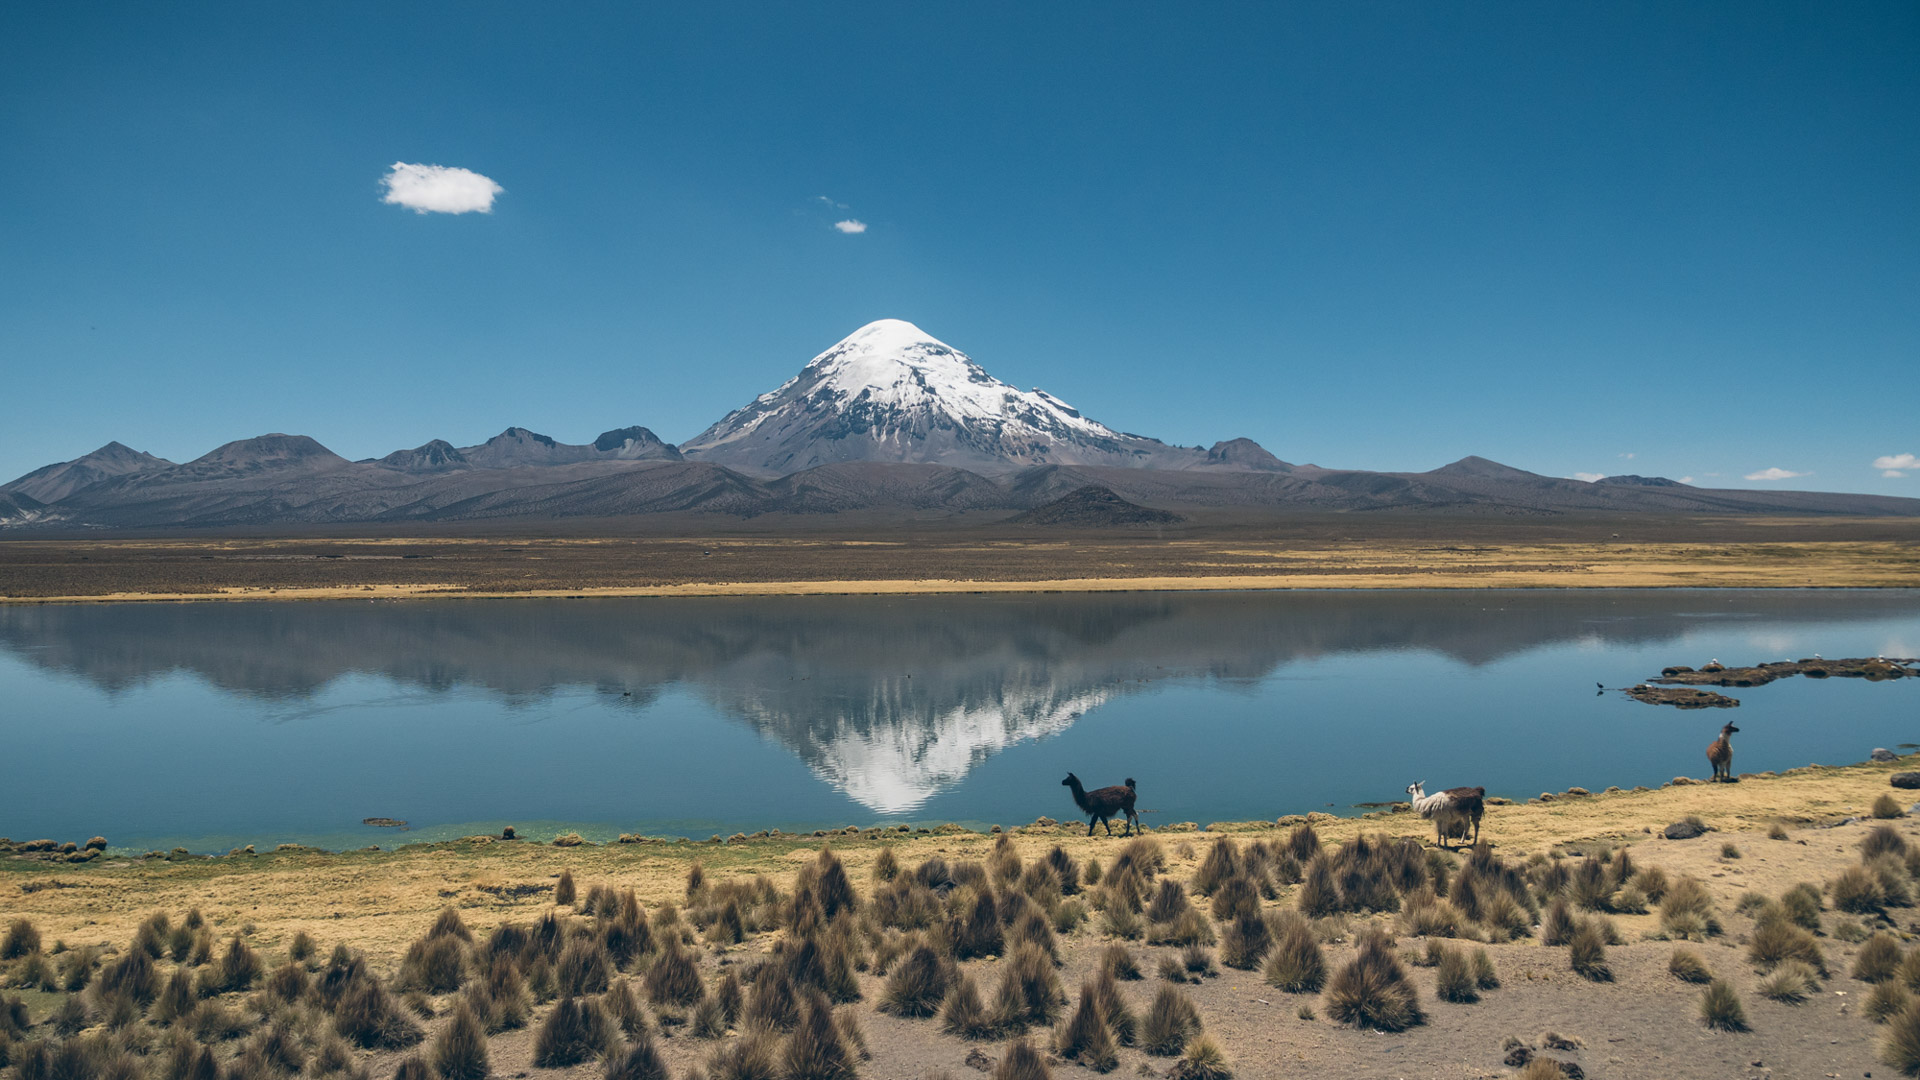 Volcan Nevado Sajama